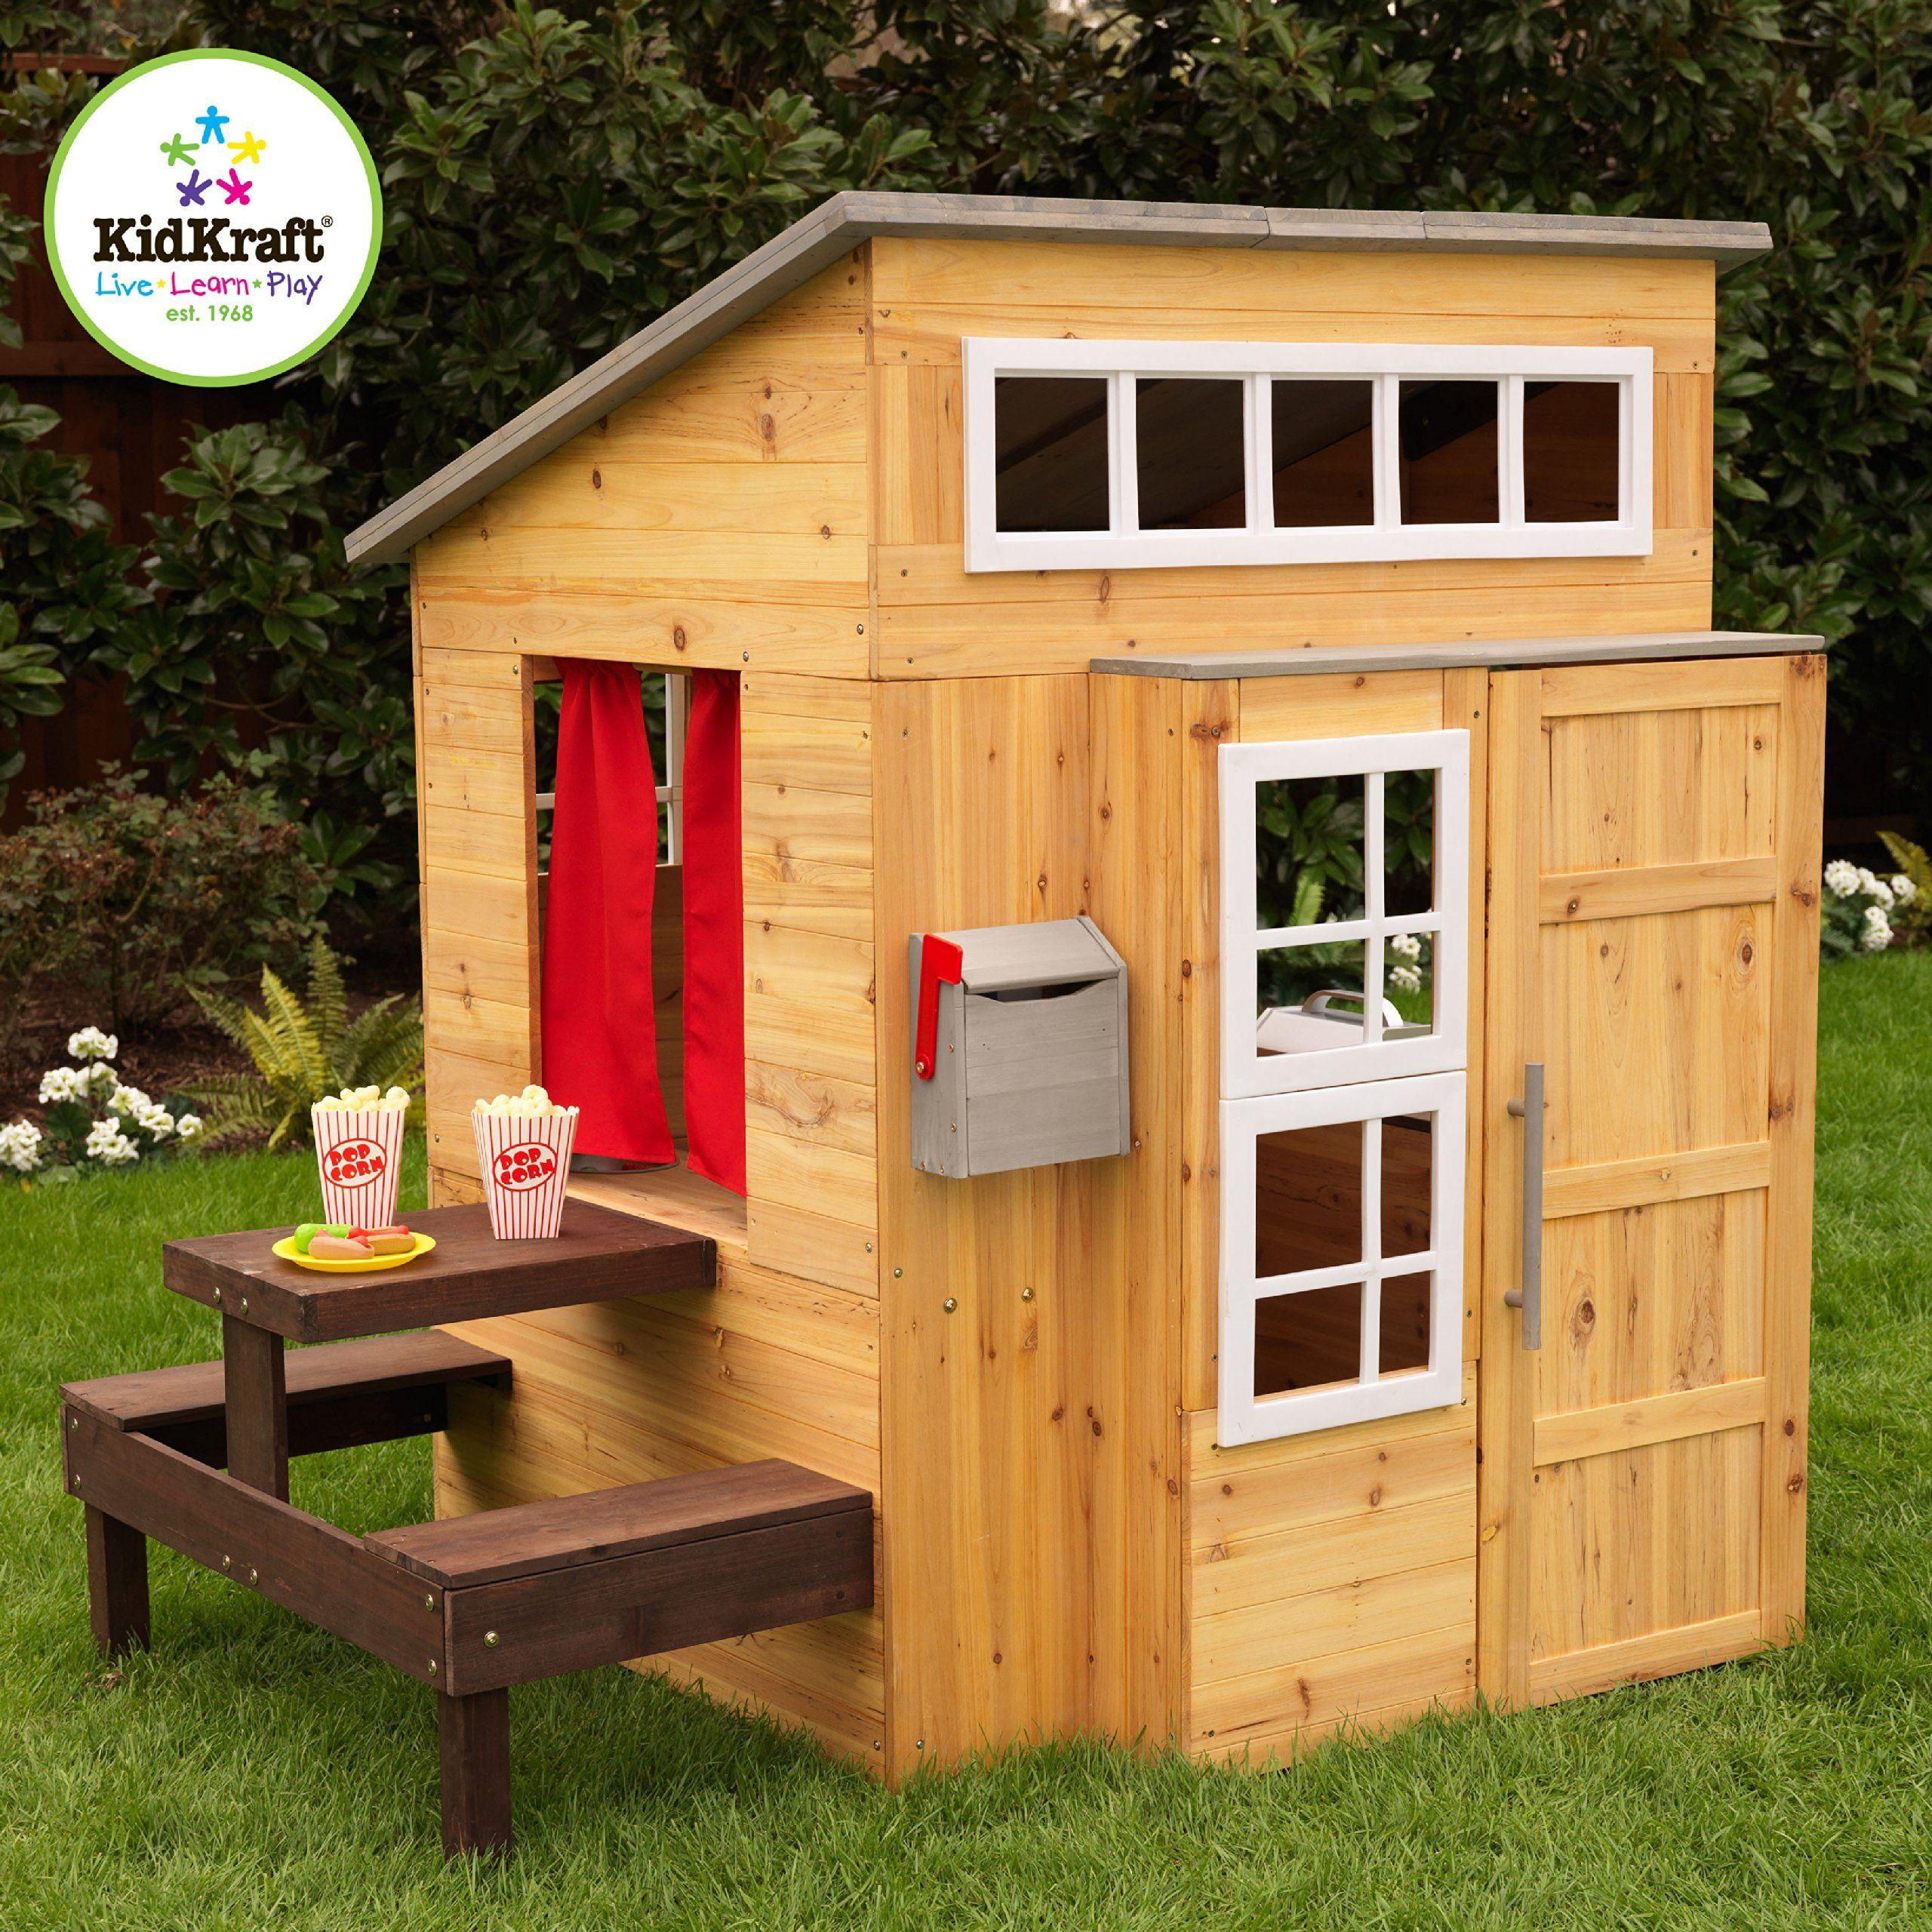 Amazoncom Kidkraft Modern Outdoor Playhouse Toys Games Rumah